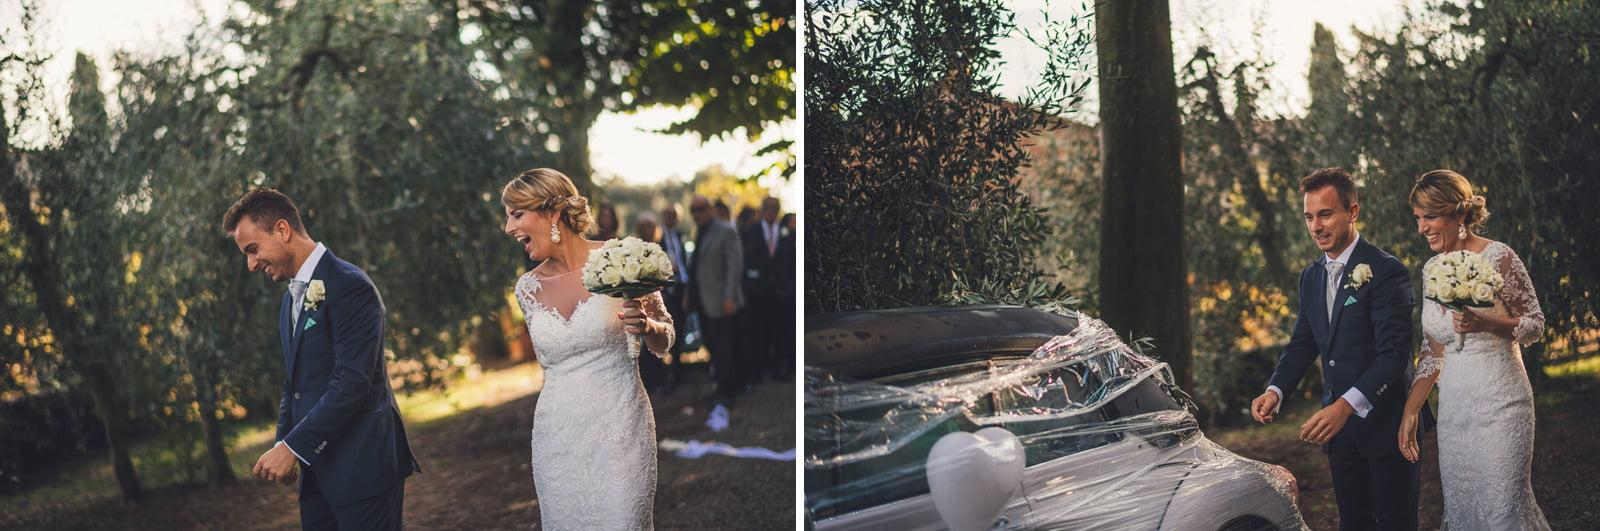 062-wedding-florence-palazzo-borghese